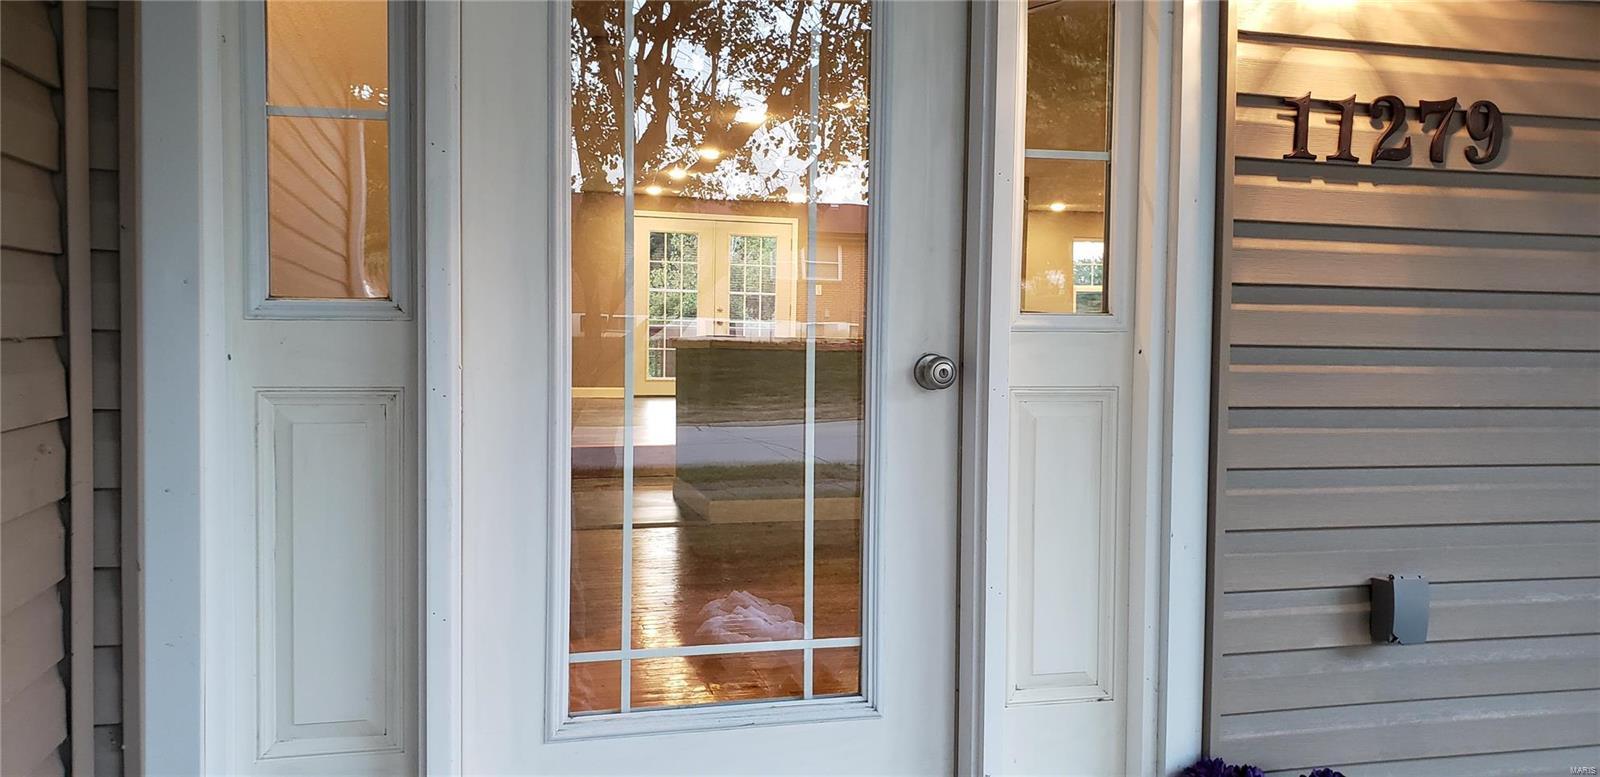 11279 Prentice Drive Property Photo - Florissant, MO real estate listing